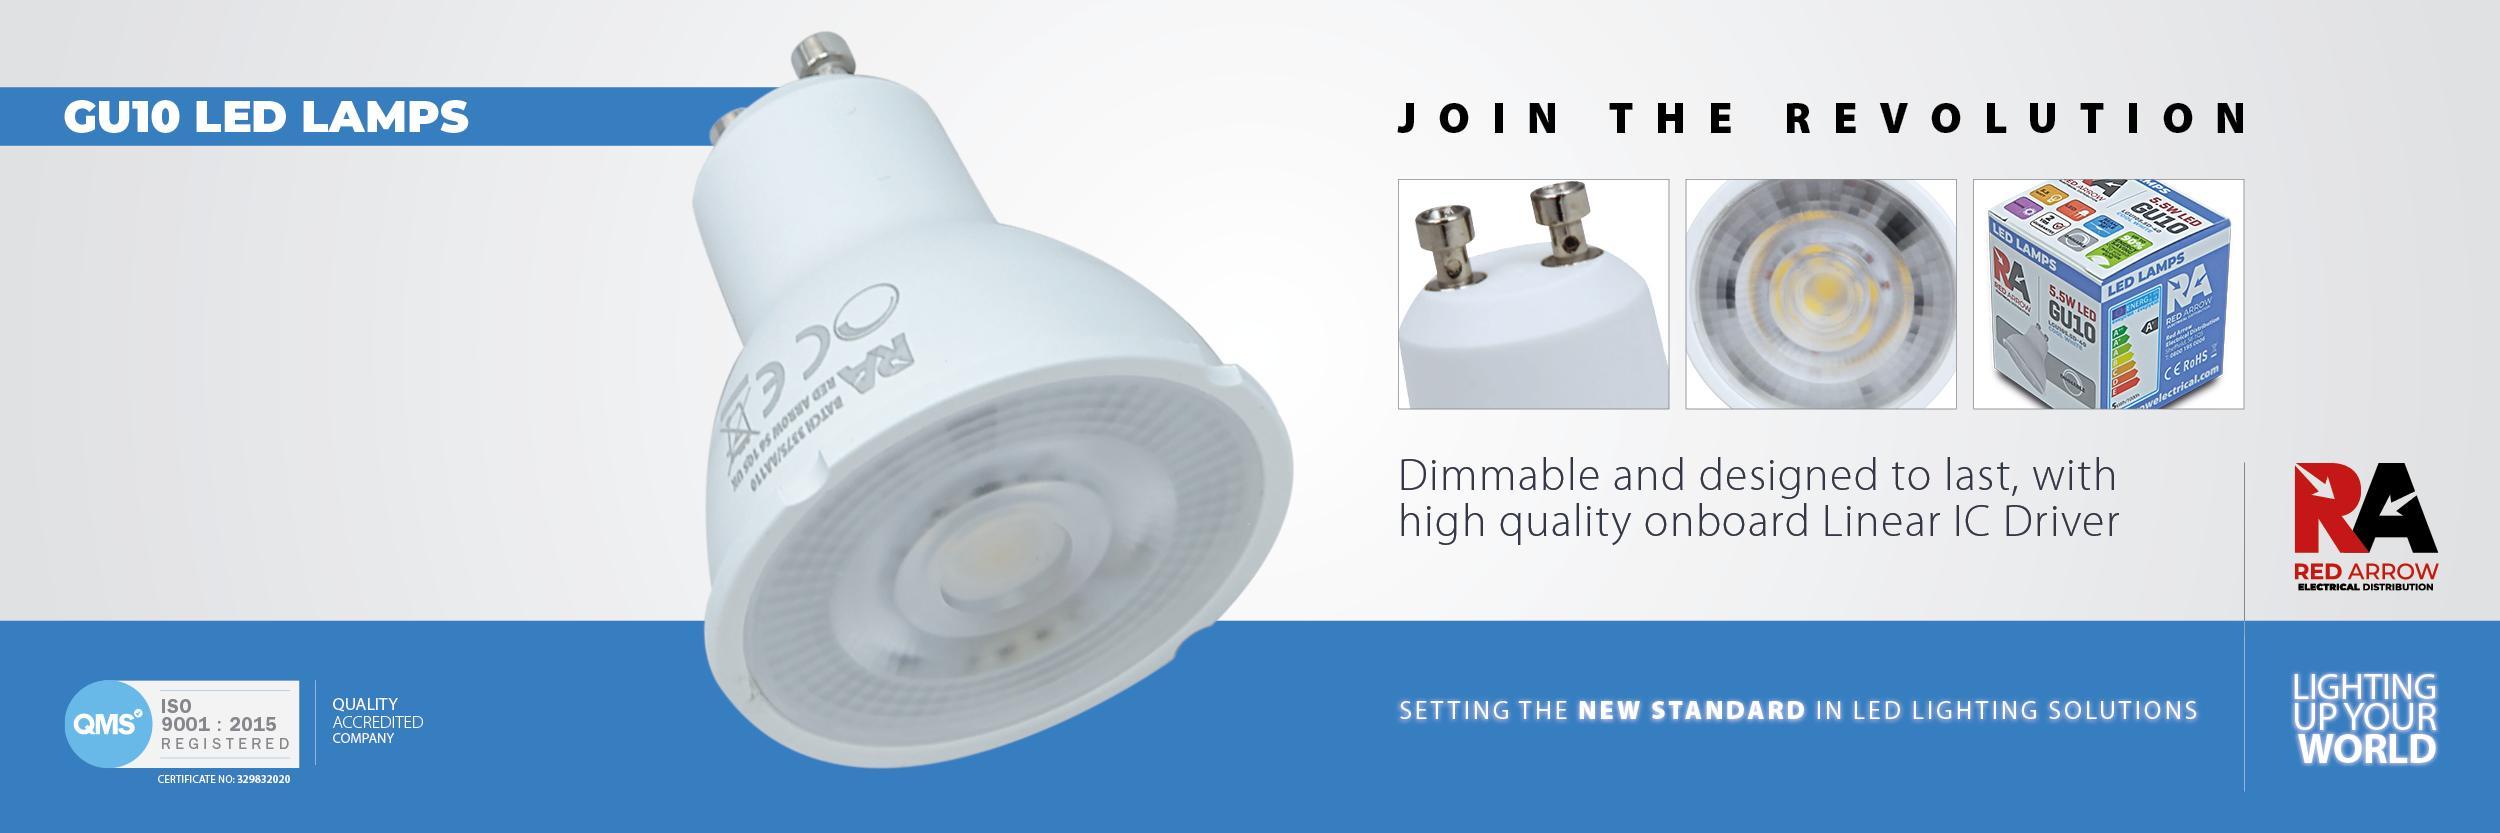 LED GU10 Lamps Web Banner